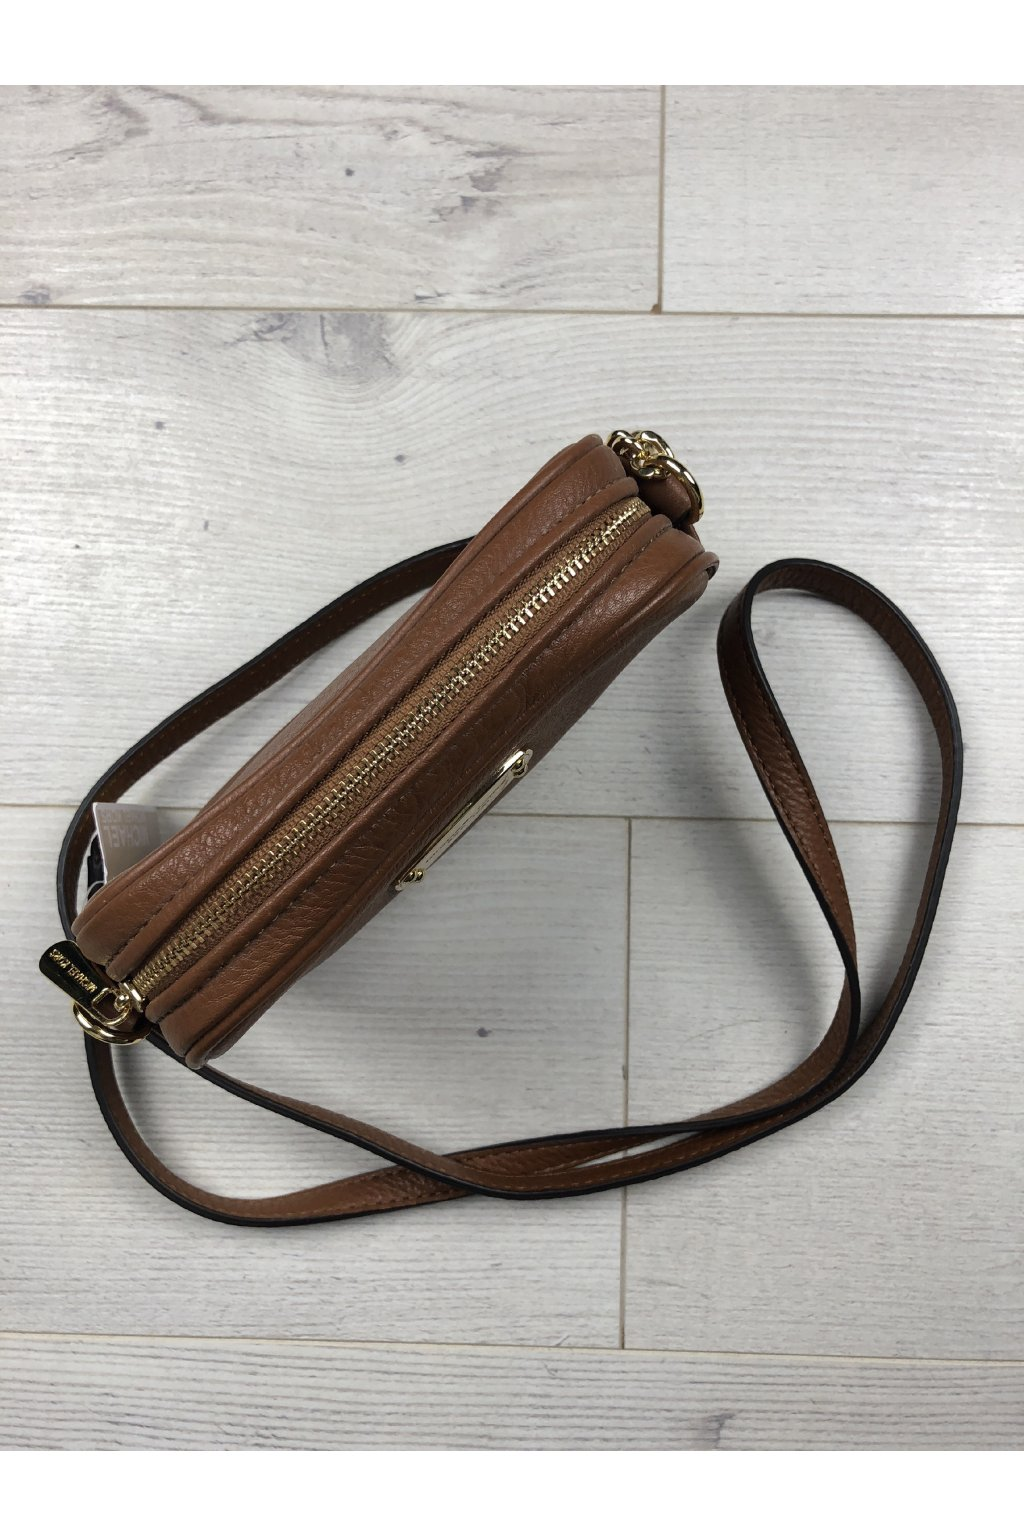 ... crossbody michael kors hamilton small luggage eshopat cz 3 5347d5b228a